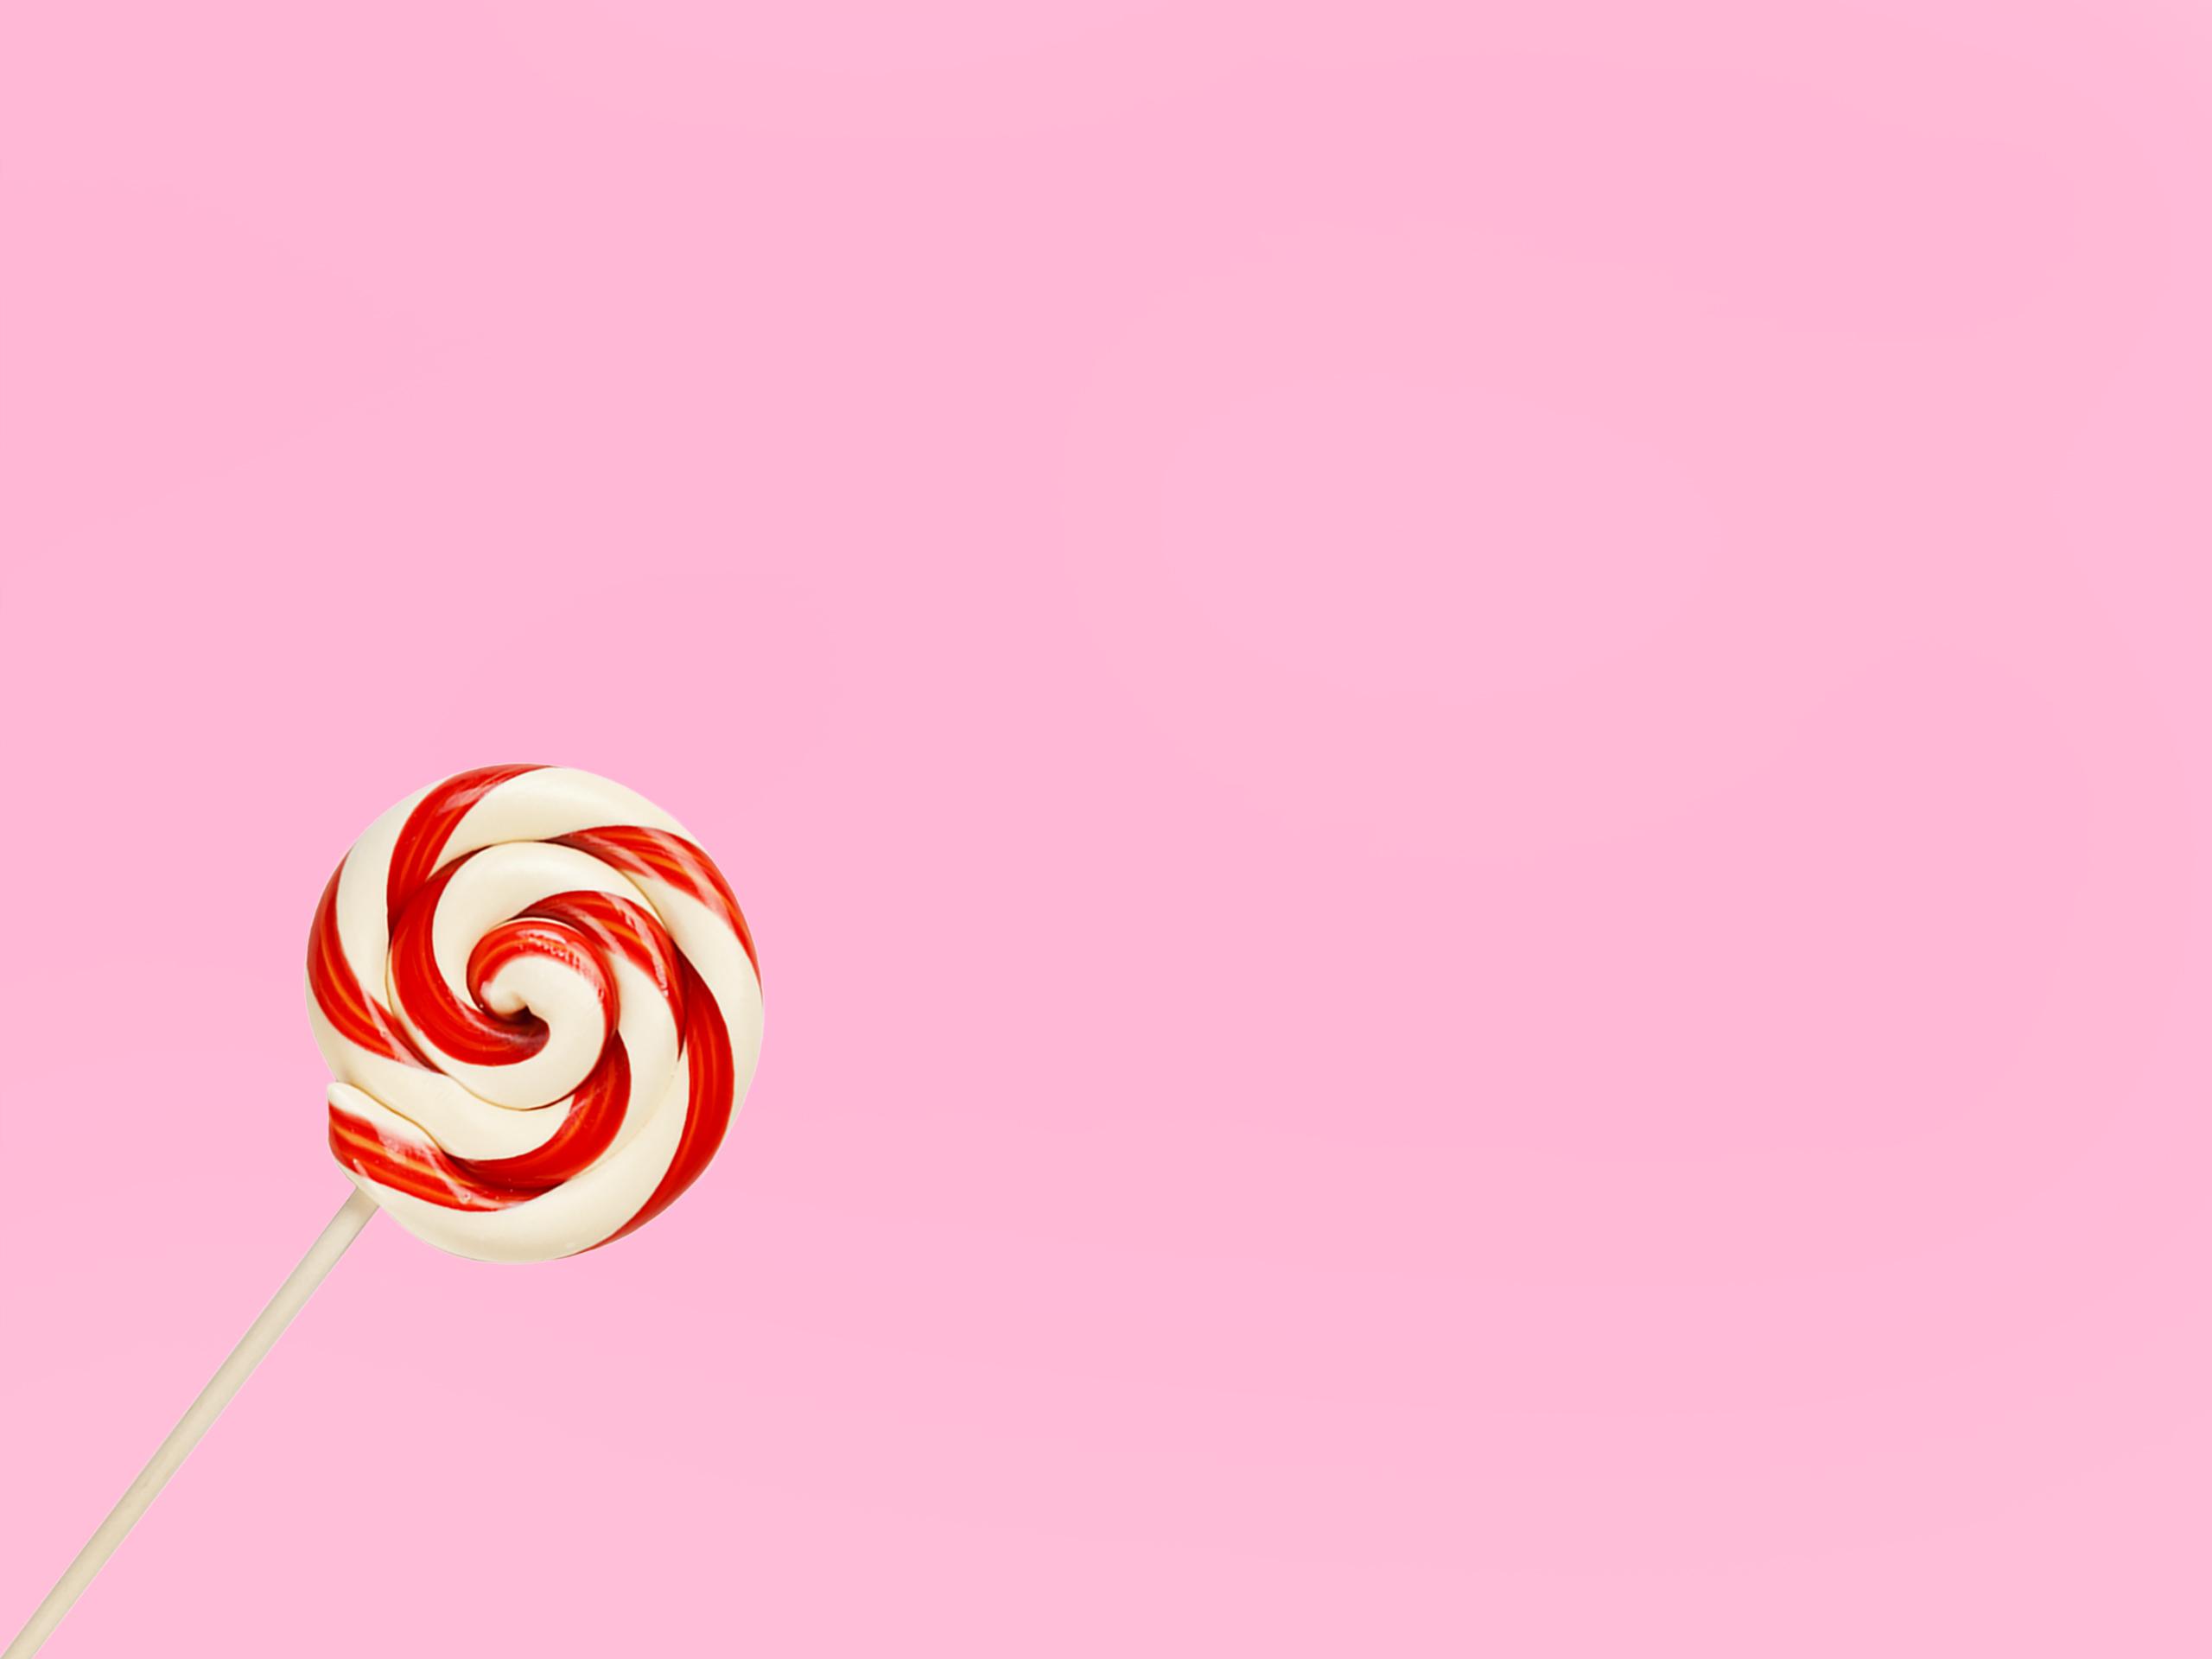 Change Wallpaper On Iphone 1000 Amazing Pink Background Photos 183 Pexels 183 Free Stock